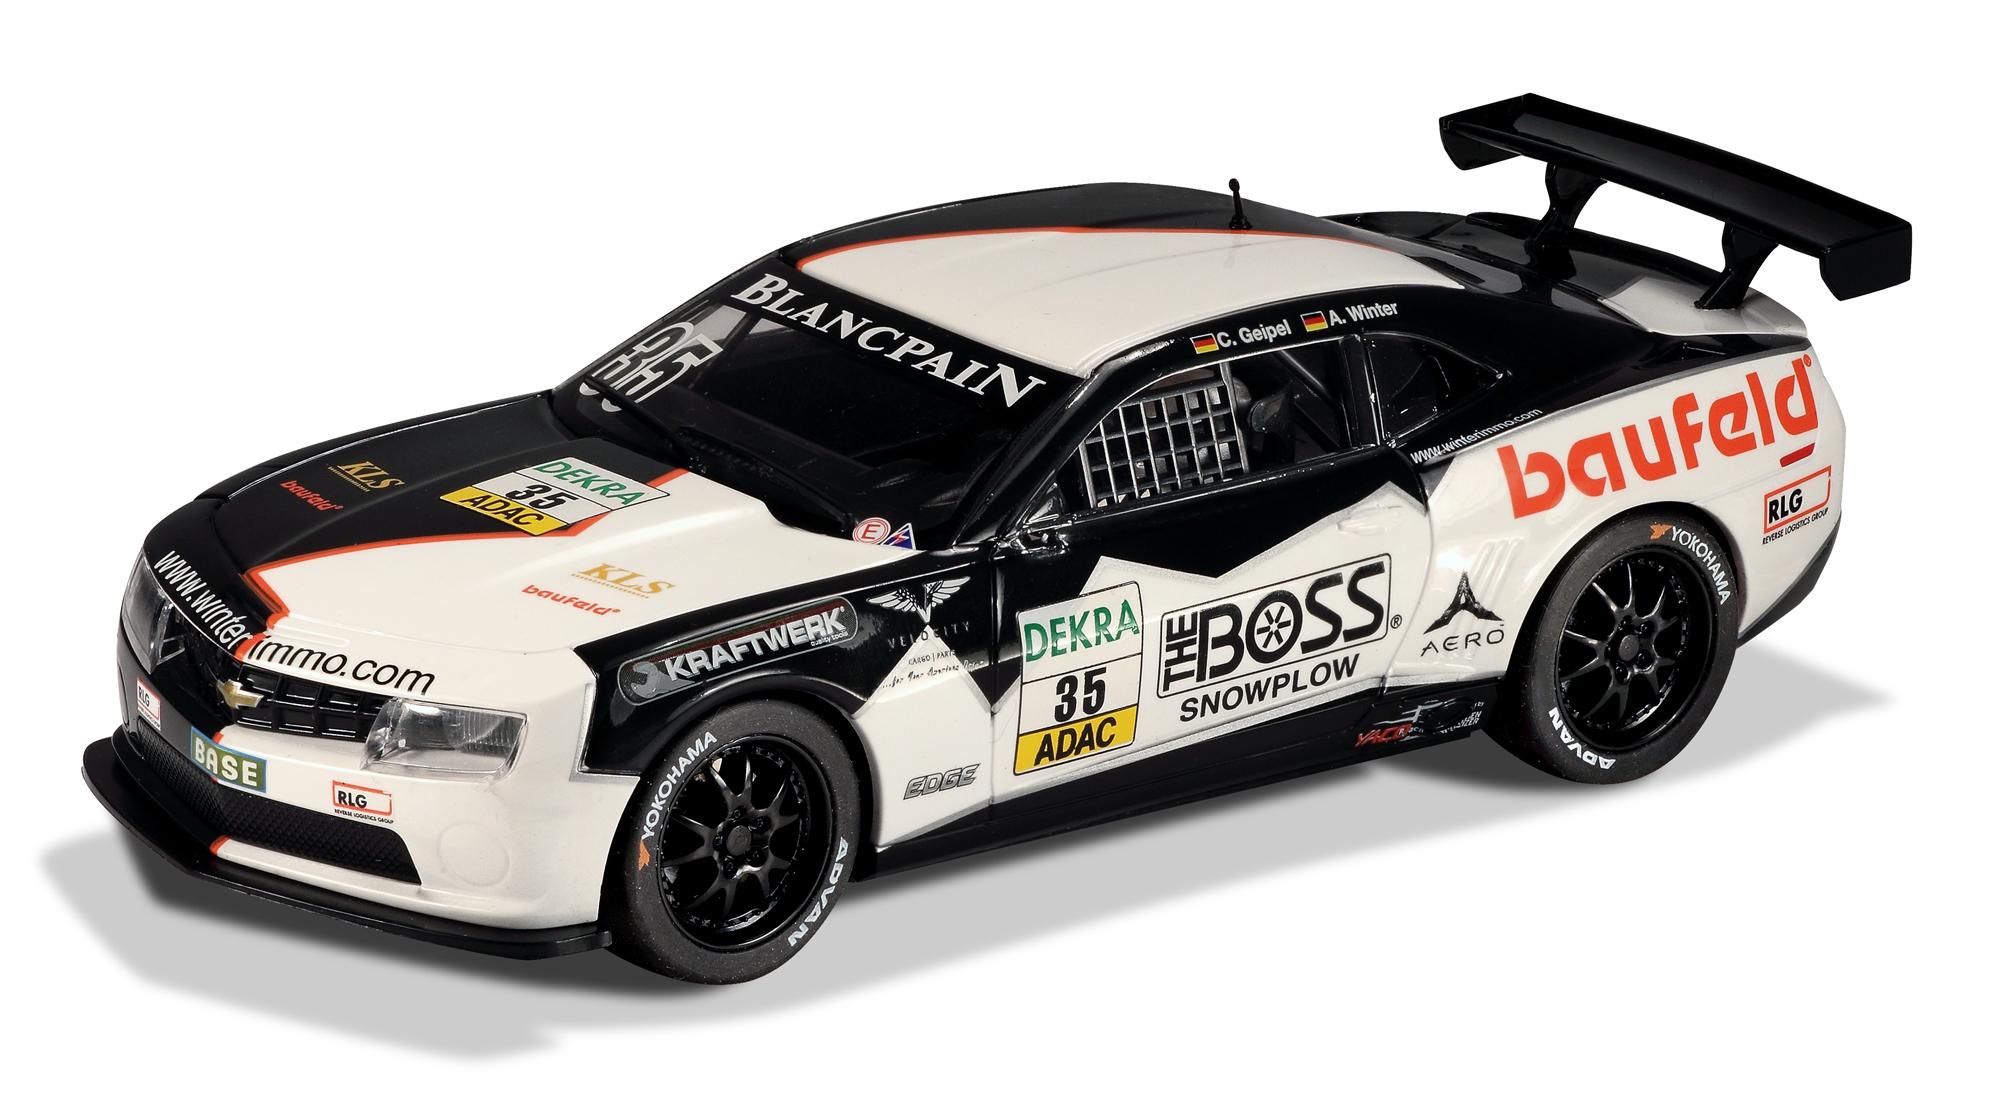 2011 Camaro Price >> Scalextric Slot Car Shop - Endurance Cars